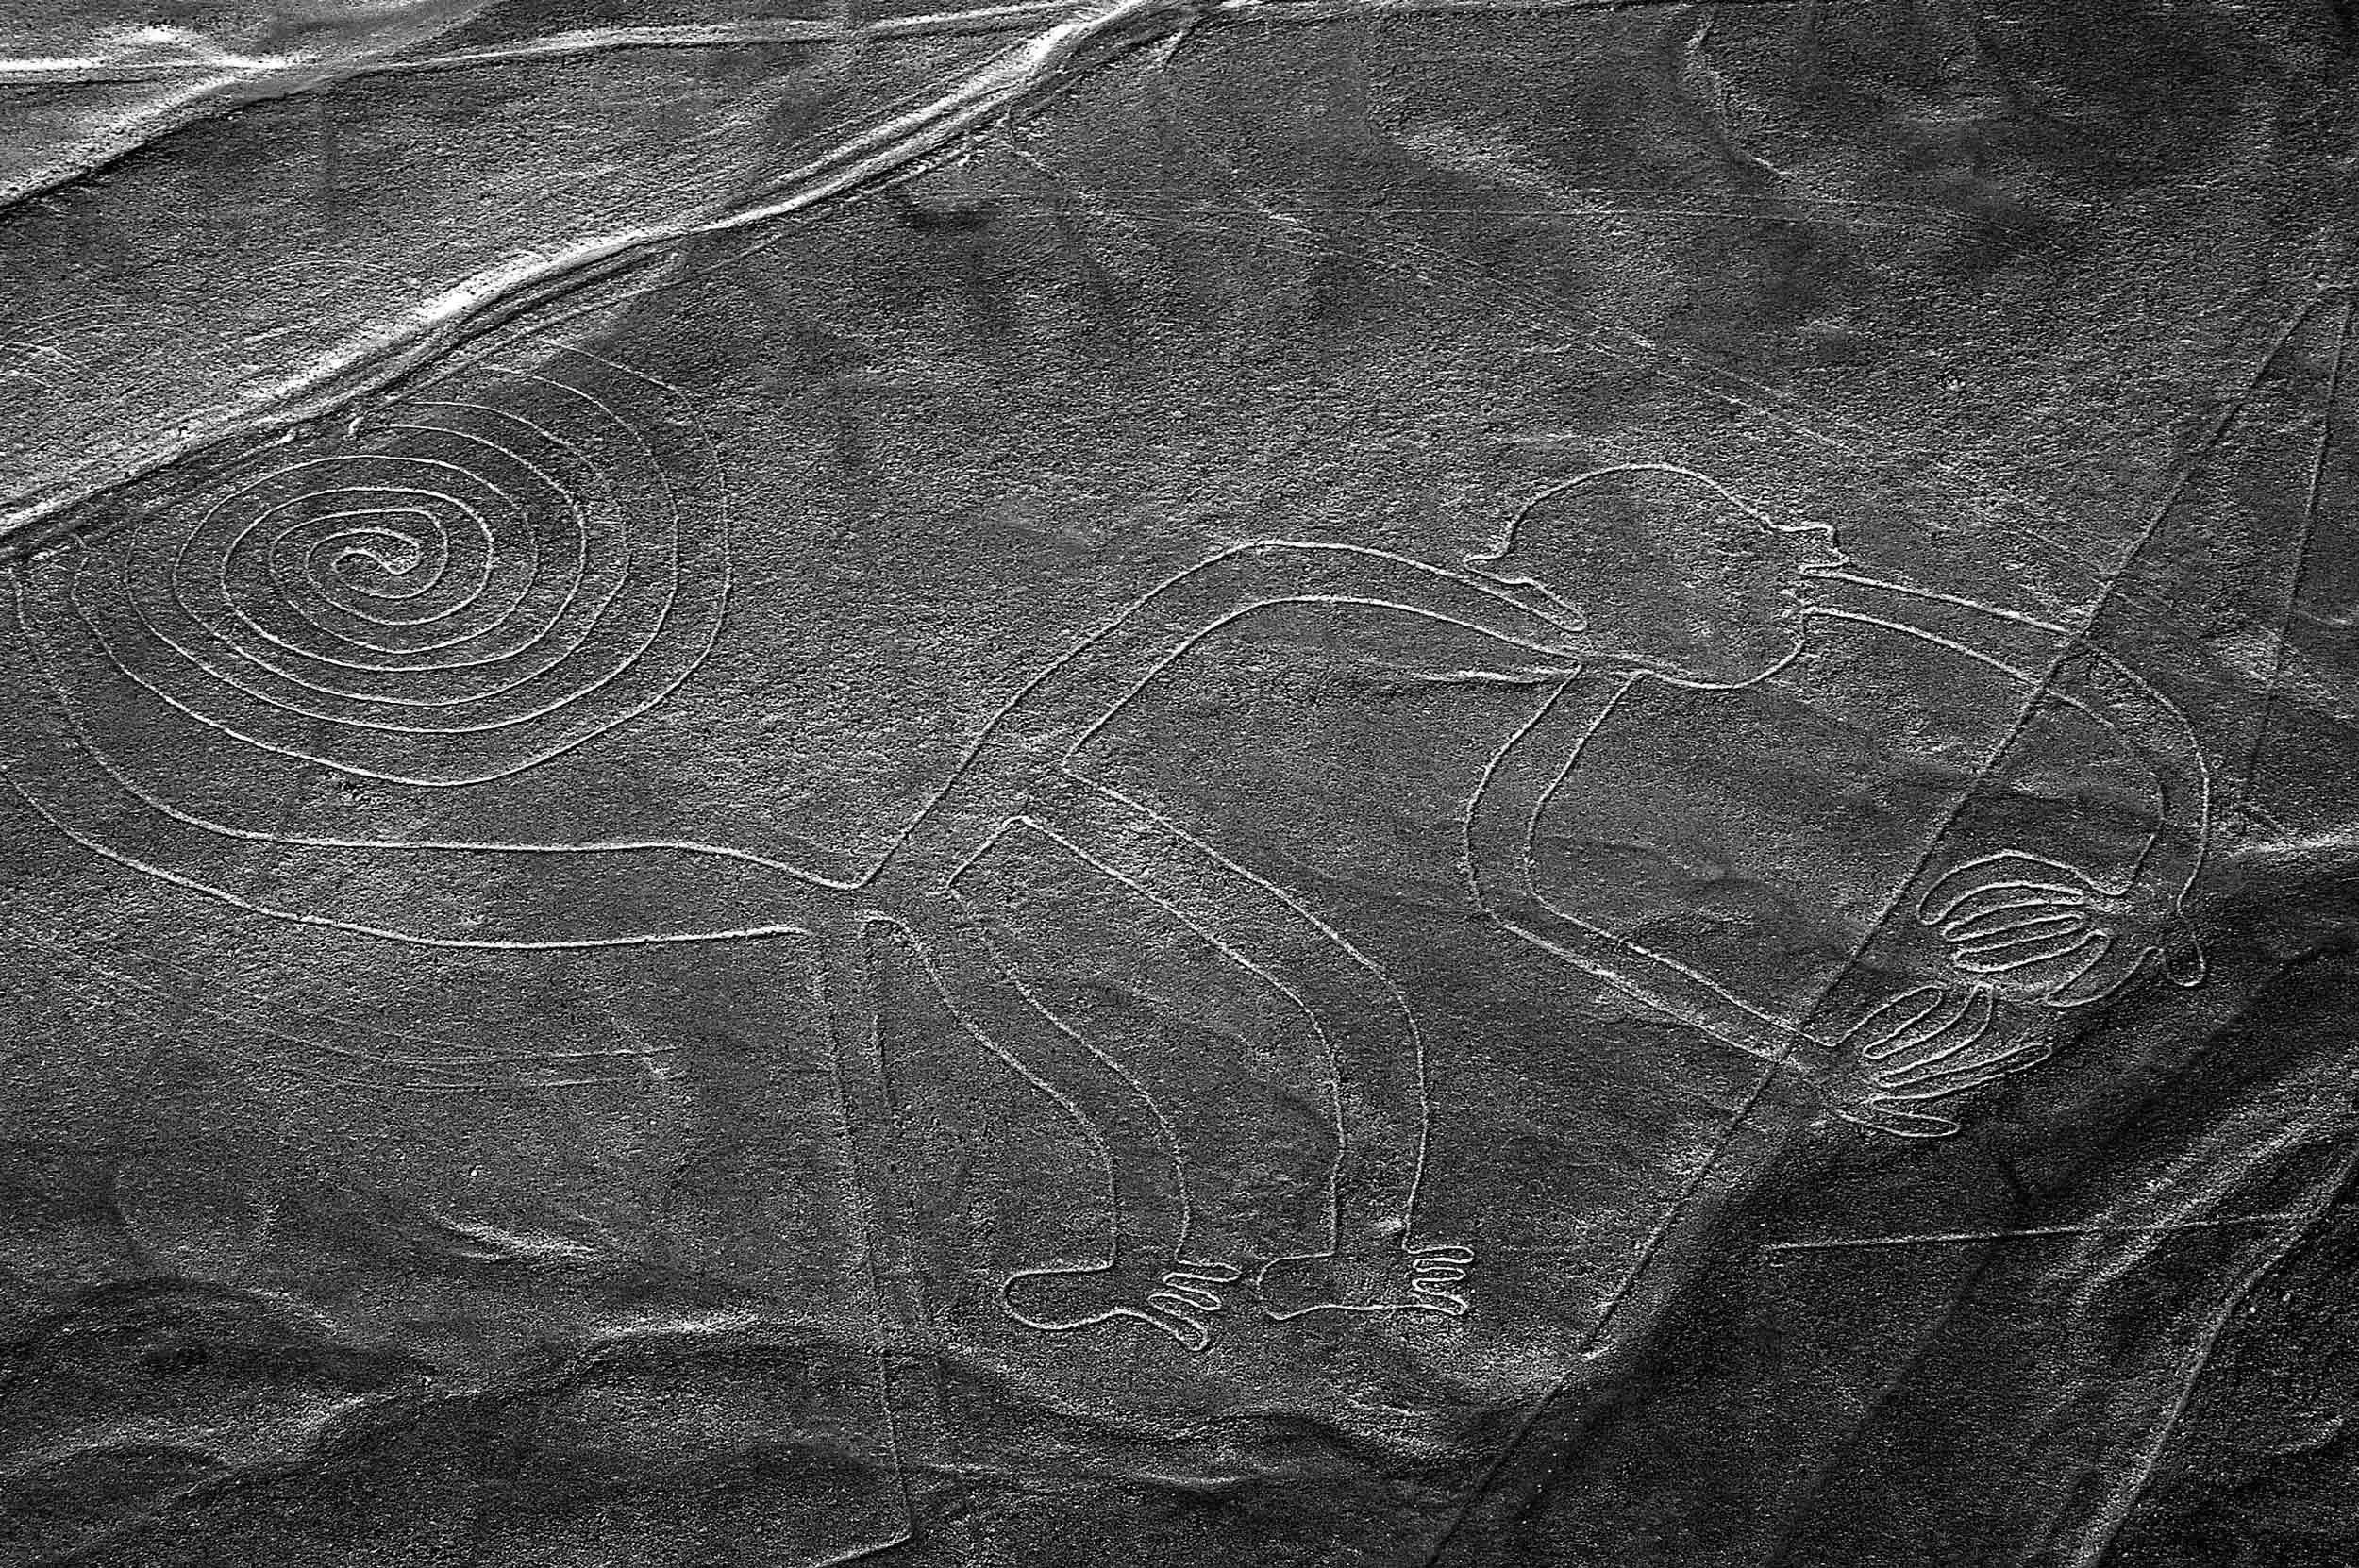 'The Monkey', Nazca lines, Peru